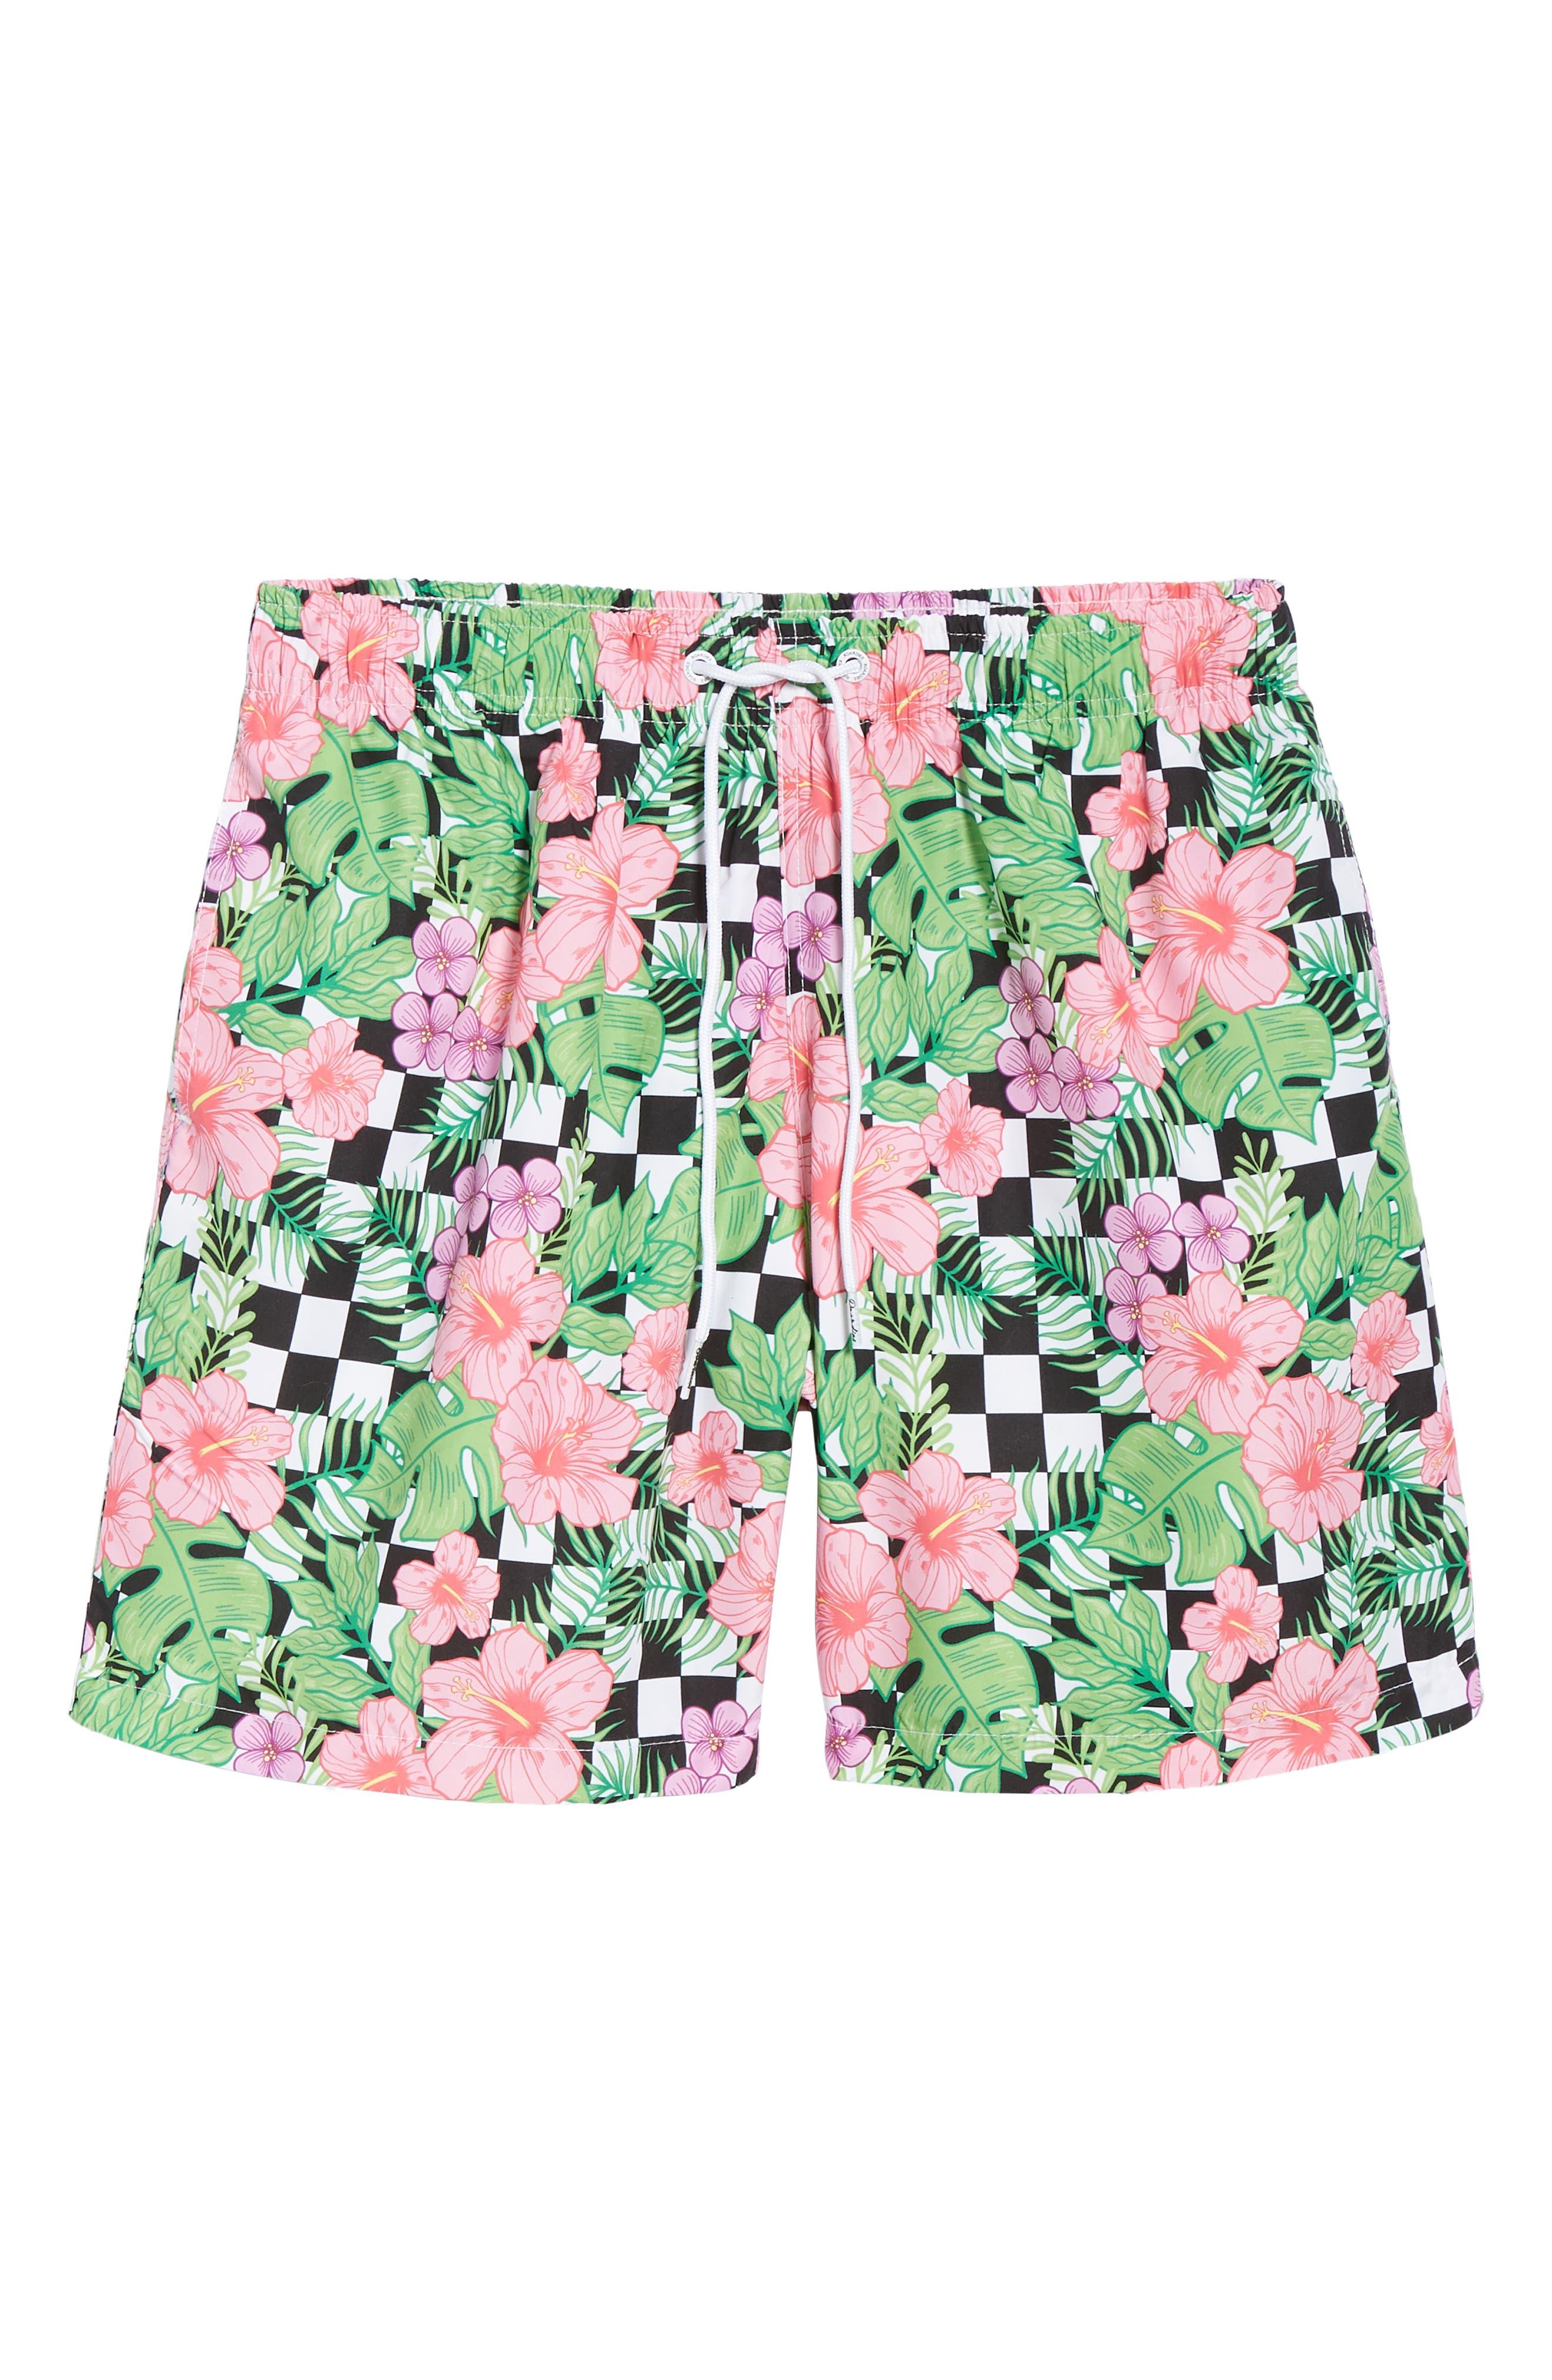 Checkerboard Floral Print Swim Trunks,                             Alternate thumbnail 6, color,                             MULTI